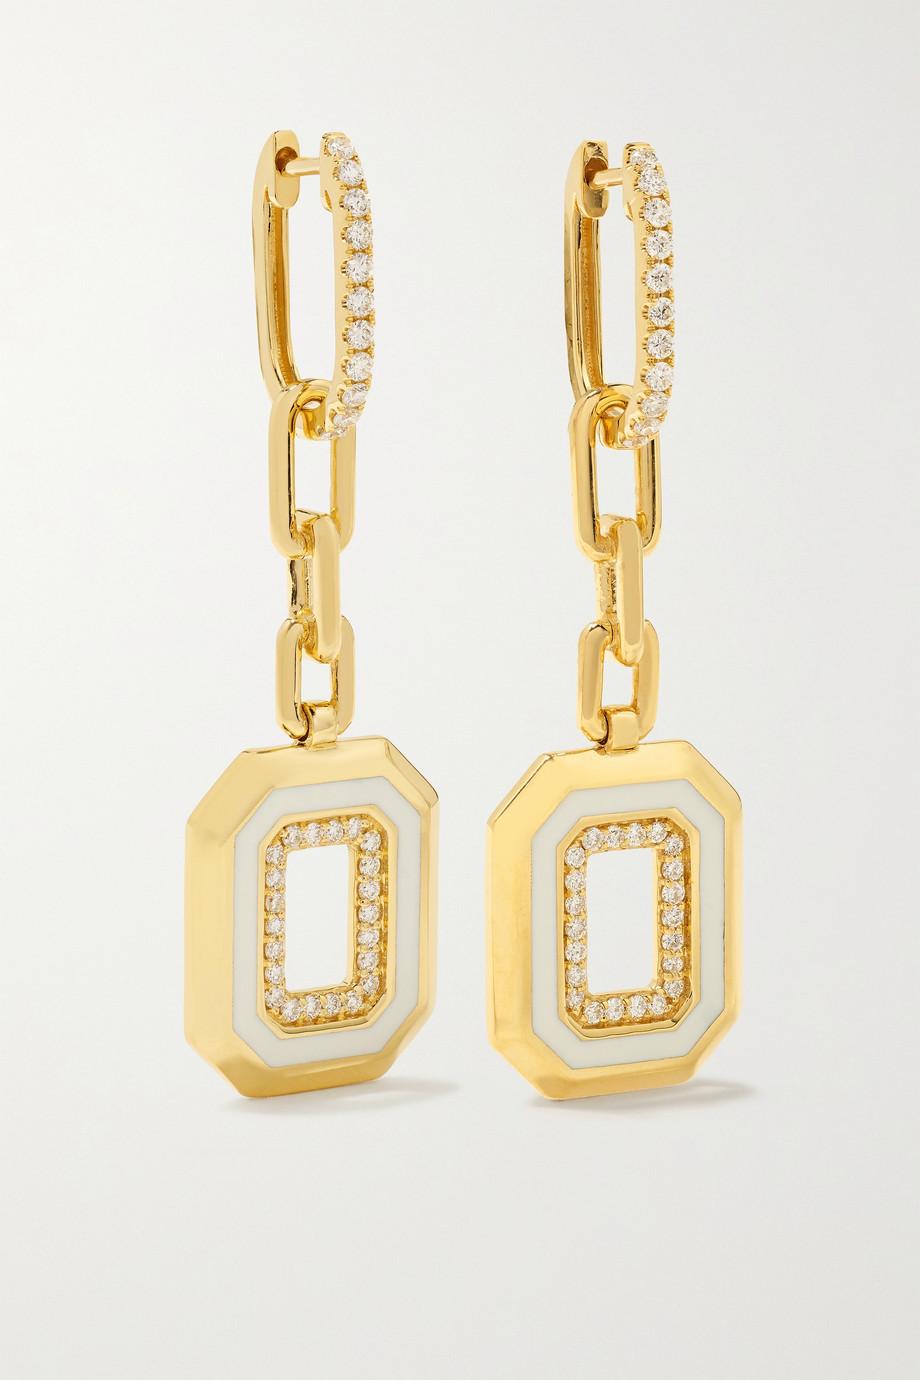 State Property Azar 18-karat gold, enamel and diamond earrings